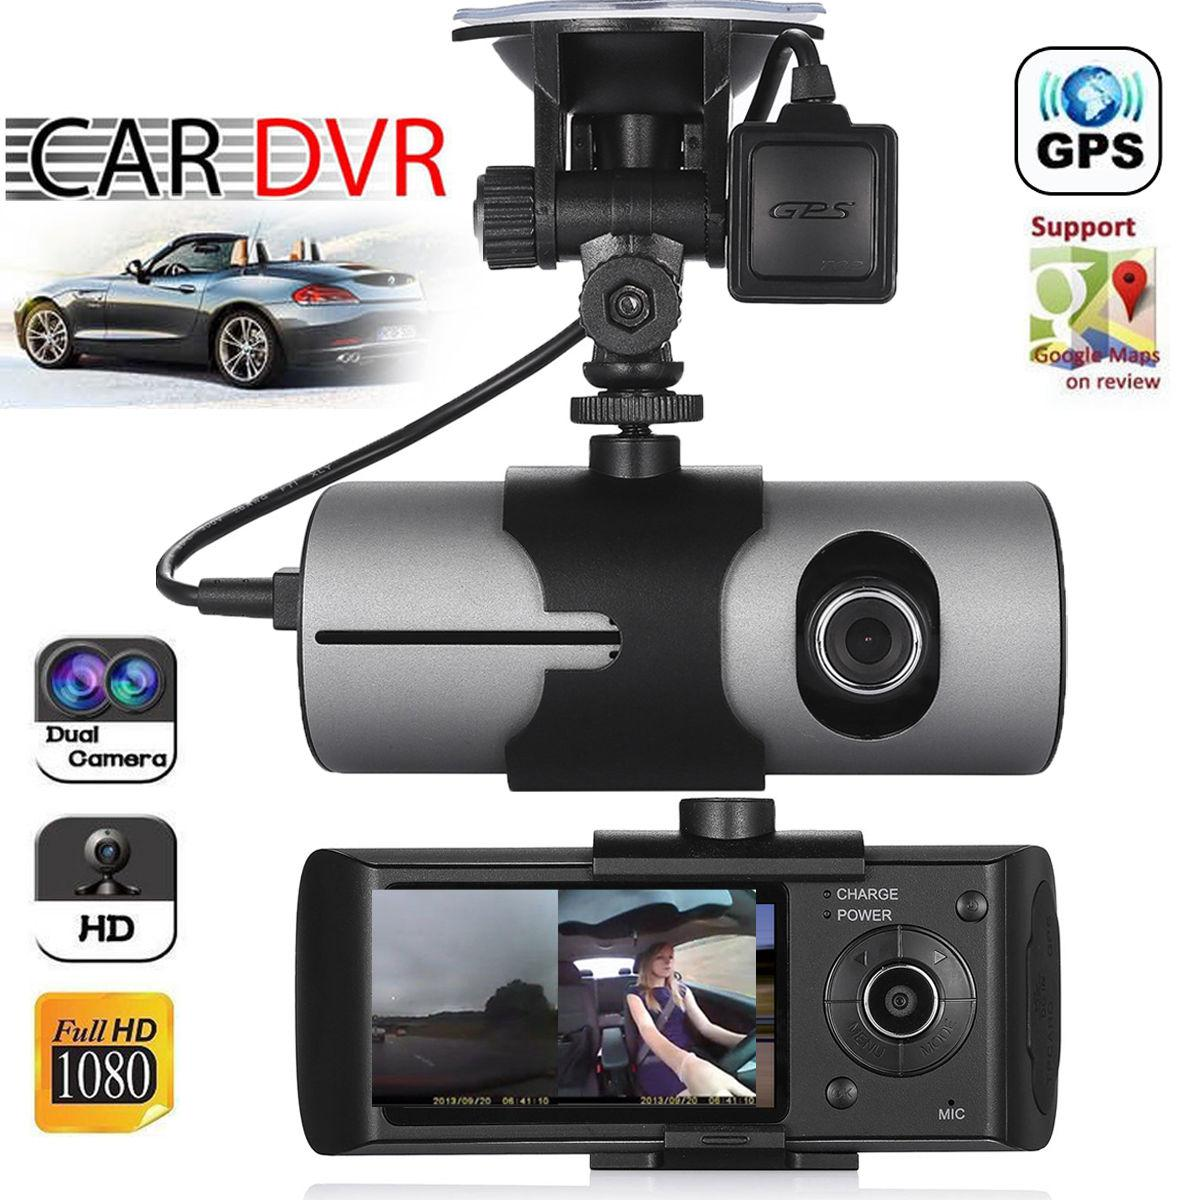 Upgraded Doppelobjekte GPS-Kamera Full HD Car DVR Dash Cam Video Recorder G-Sensor Nachtsicht für Uber Lyft Taxifahrer